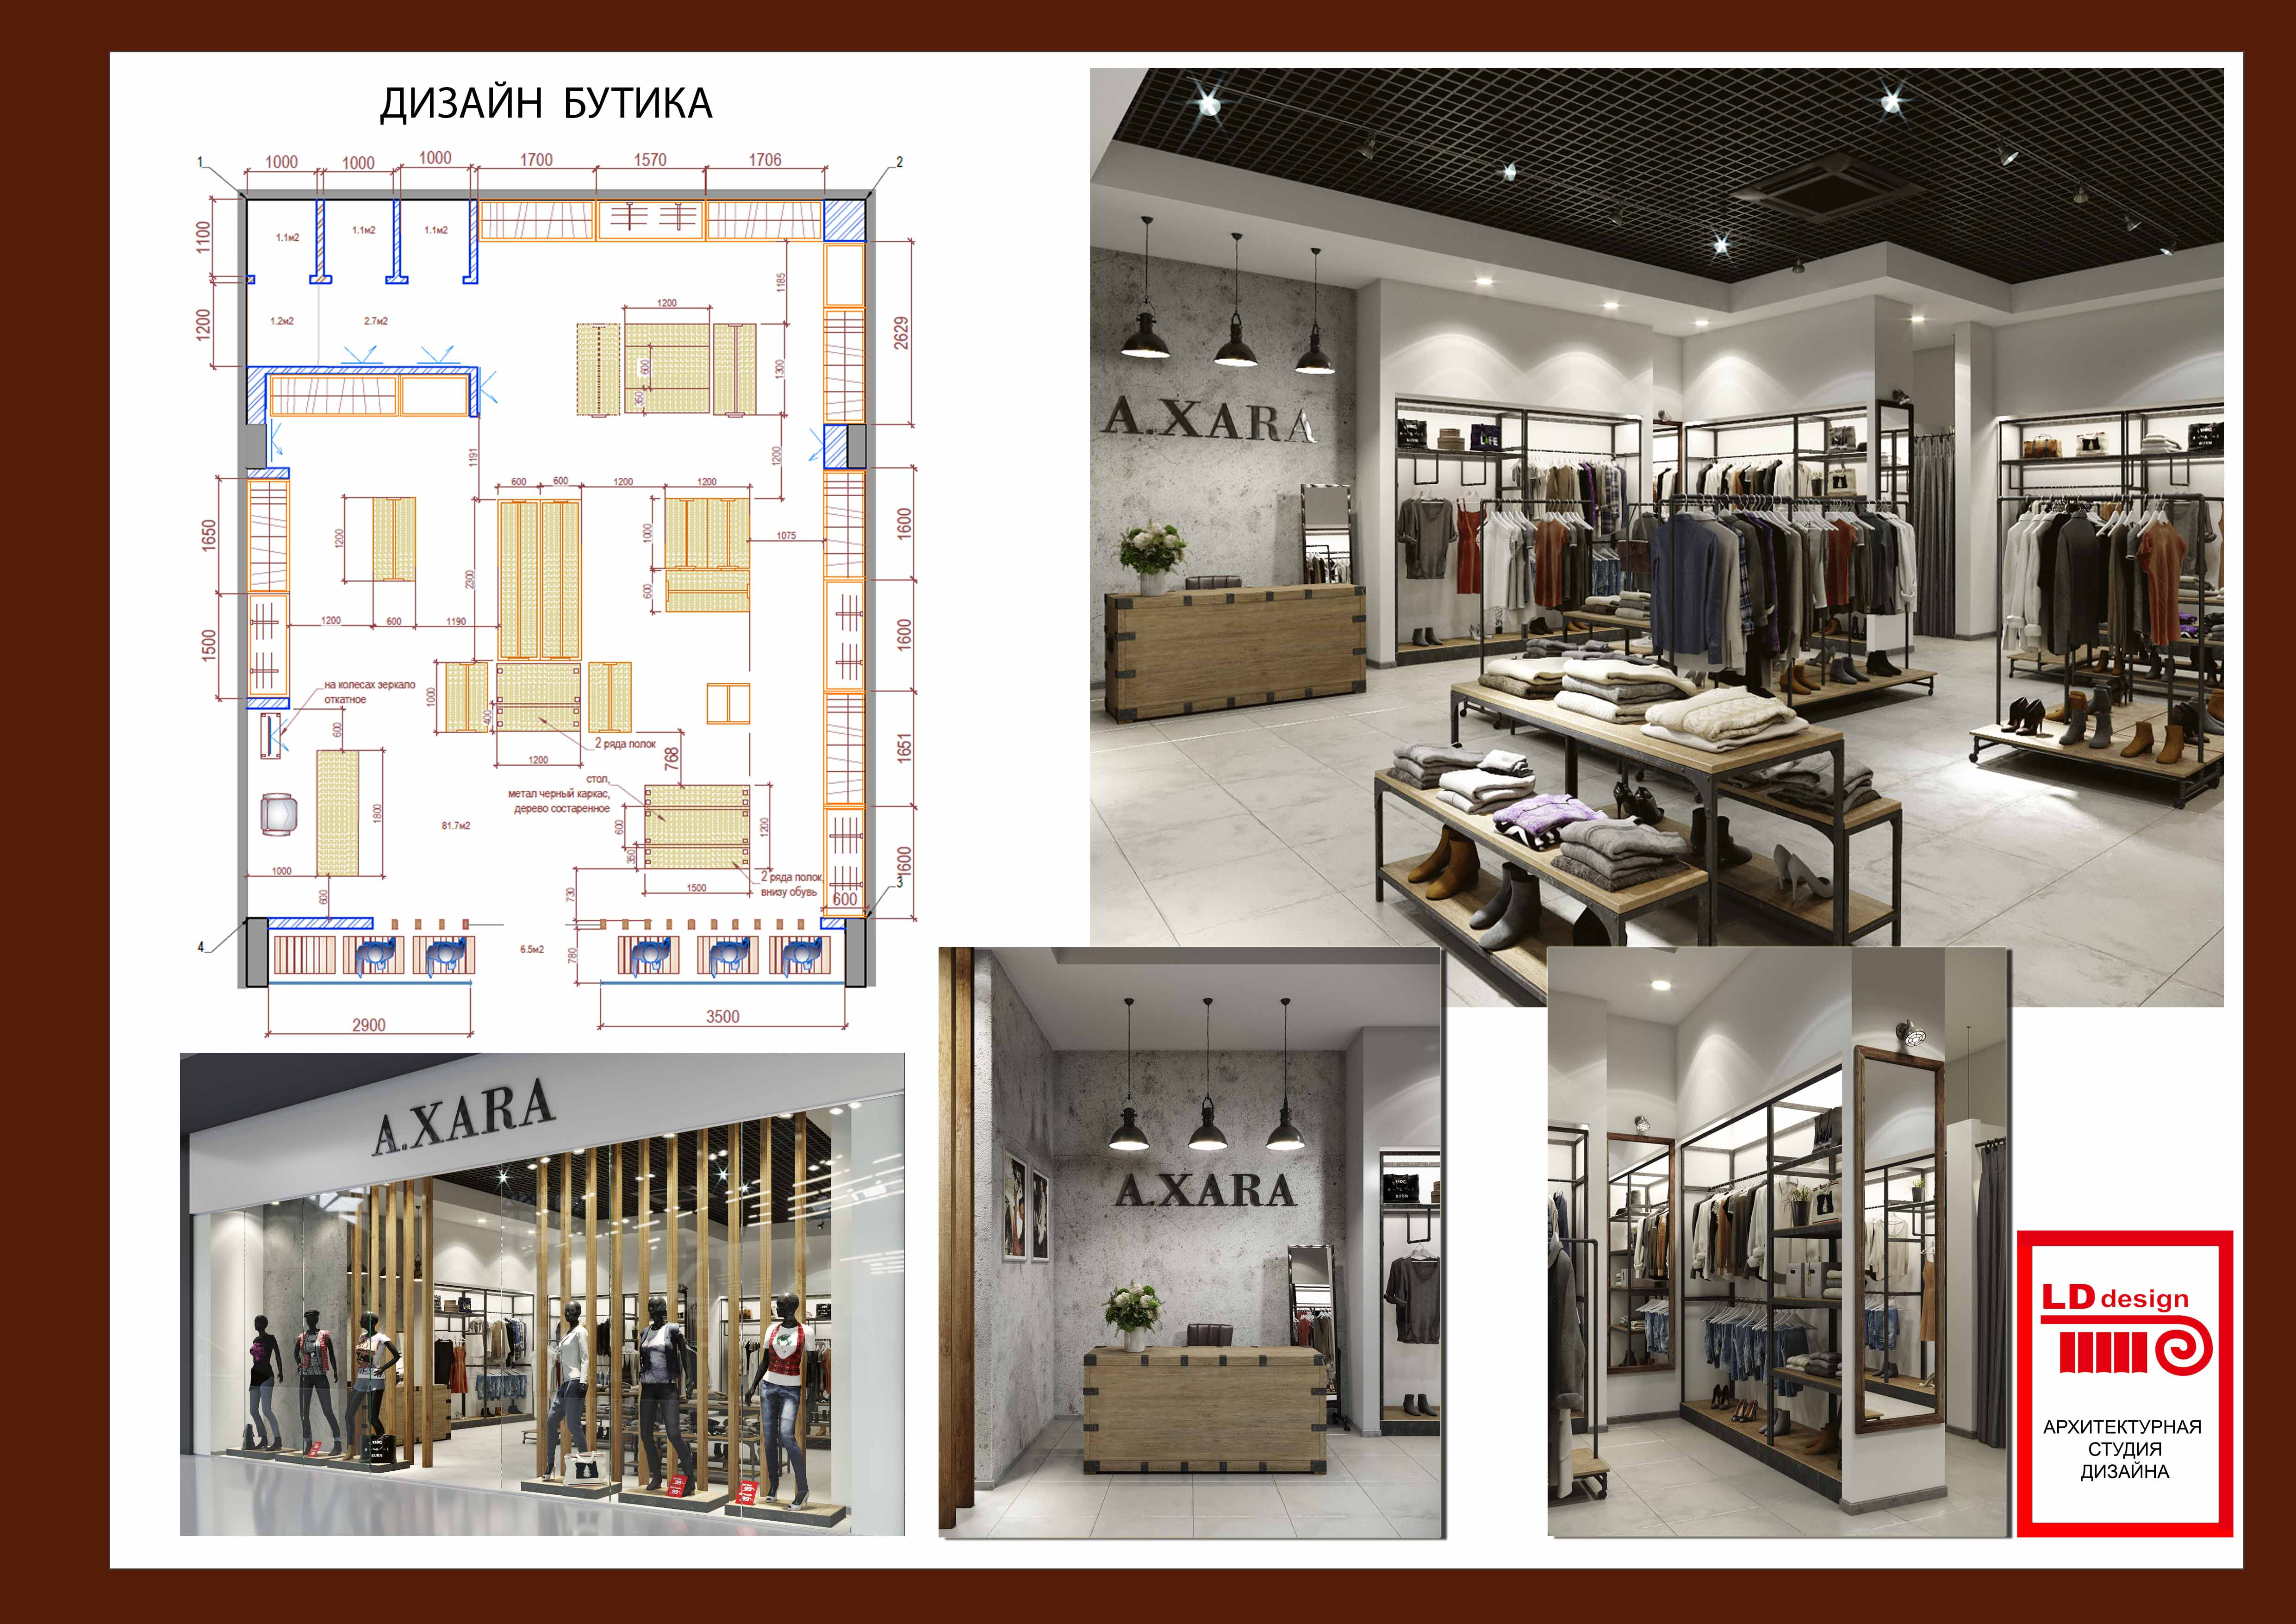 Дизайн-проект бутика, магазин однжды, бутик, ремонт бутика